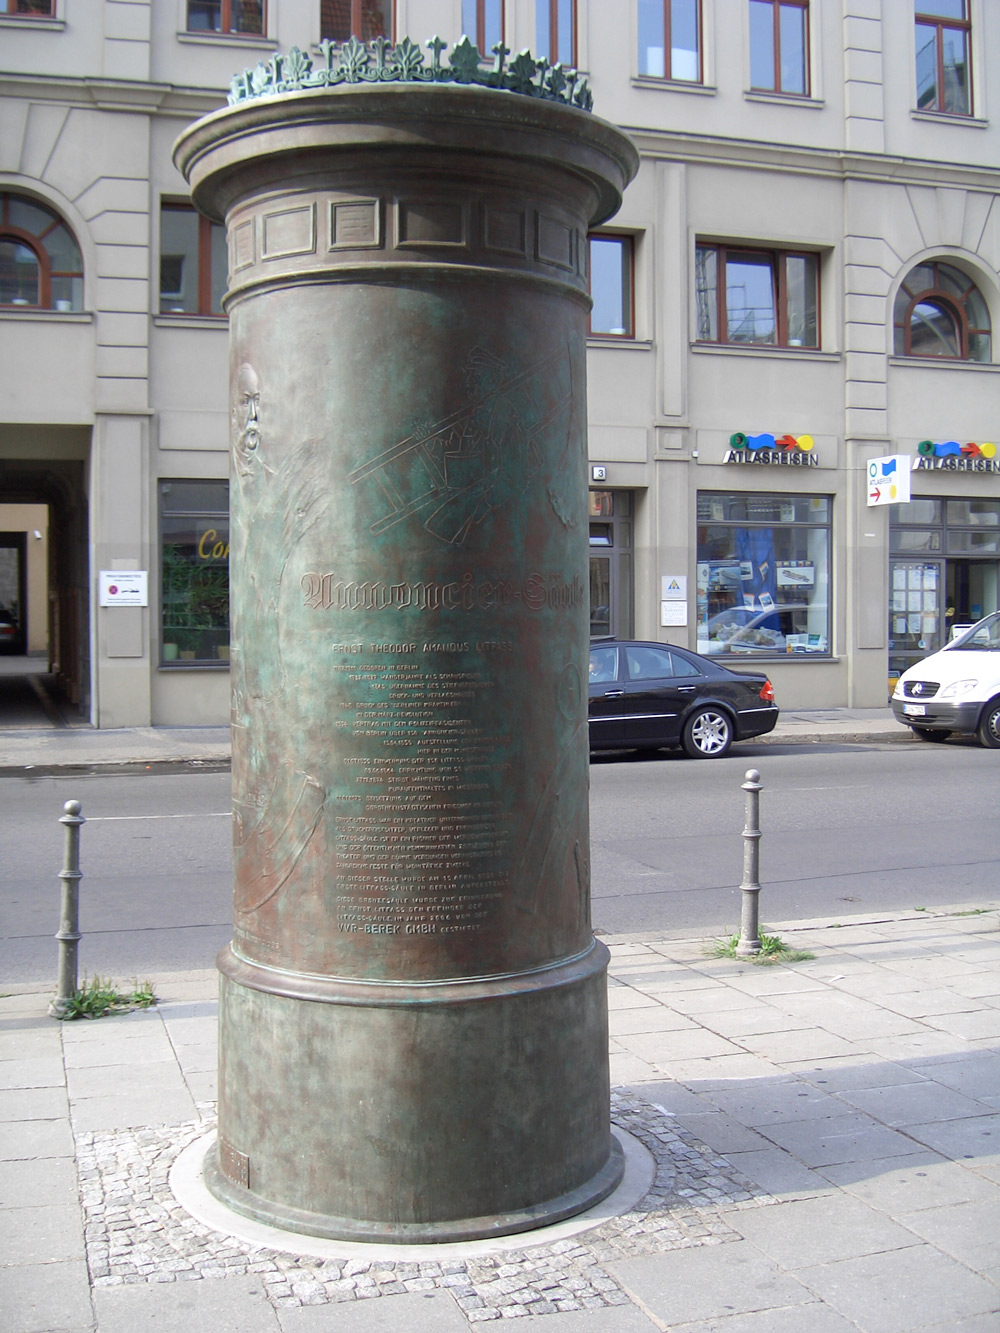 Felicitas Franck, Litfasssäule in Berlin-Mitte (2006)